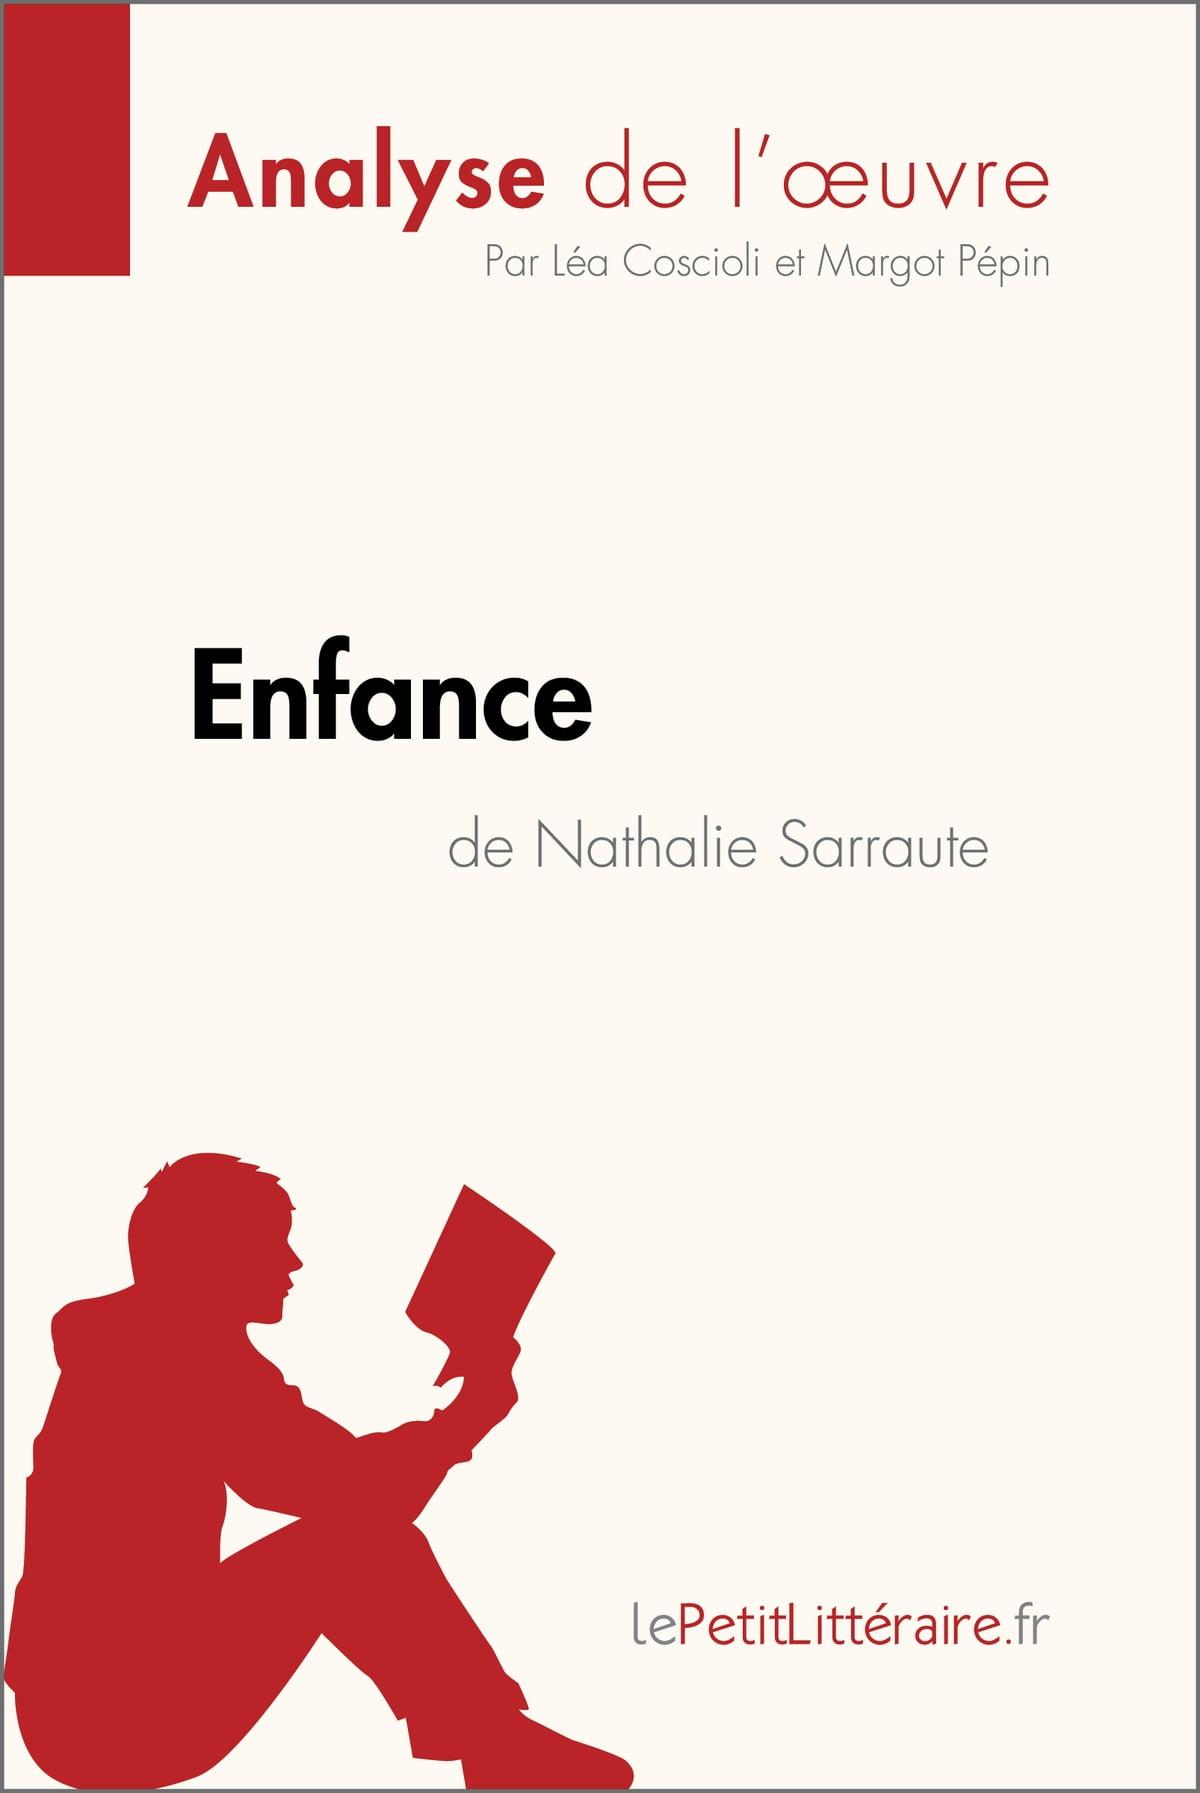 Enfance (nathalie Sarraute) : enfance, (nathalie, sarraute), Enfance, Nathalie, Sarraute, (Analyse, L'oeuvre), EBook, Coscioli, 9782806219343, Rakuten, United, States